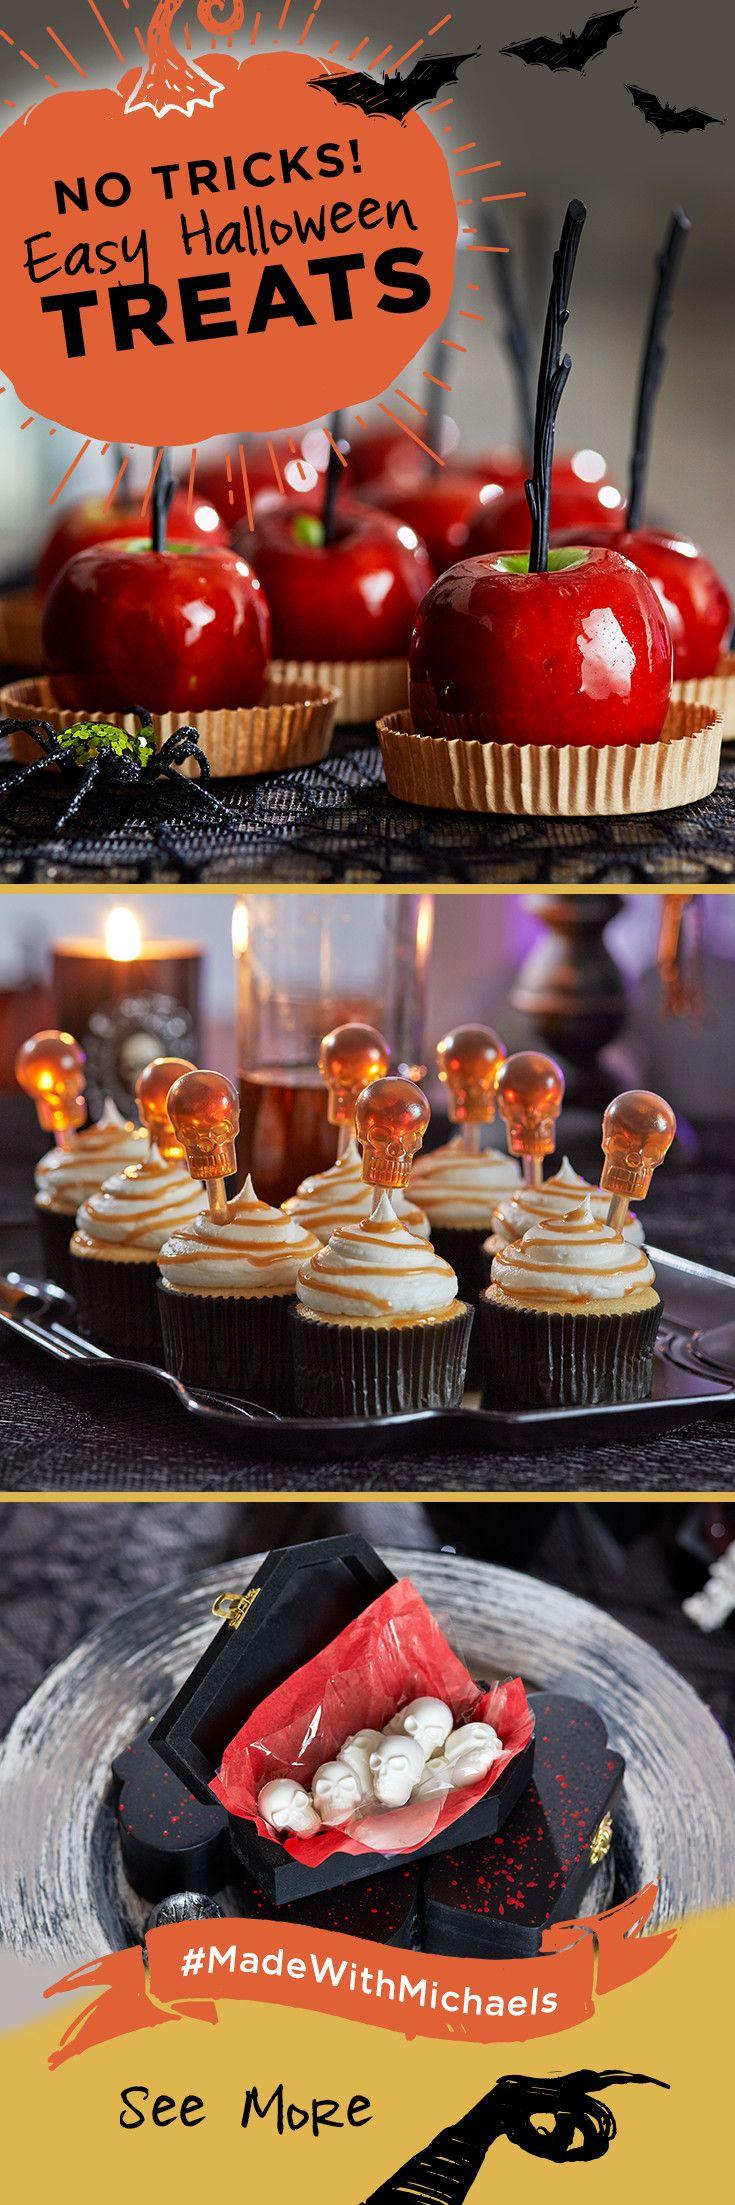 Best 25+ Michaels halloween ideas only on Pinterest   Halloween ...